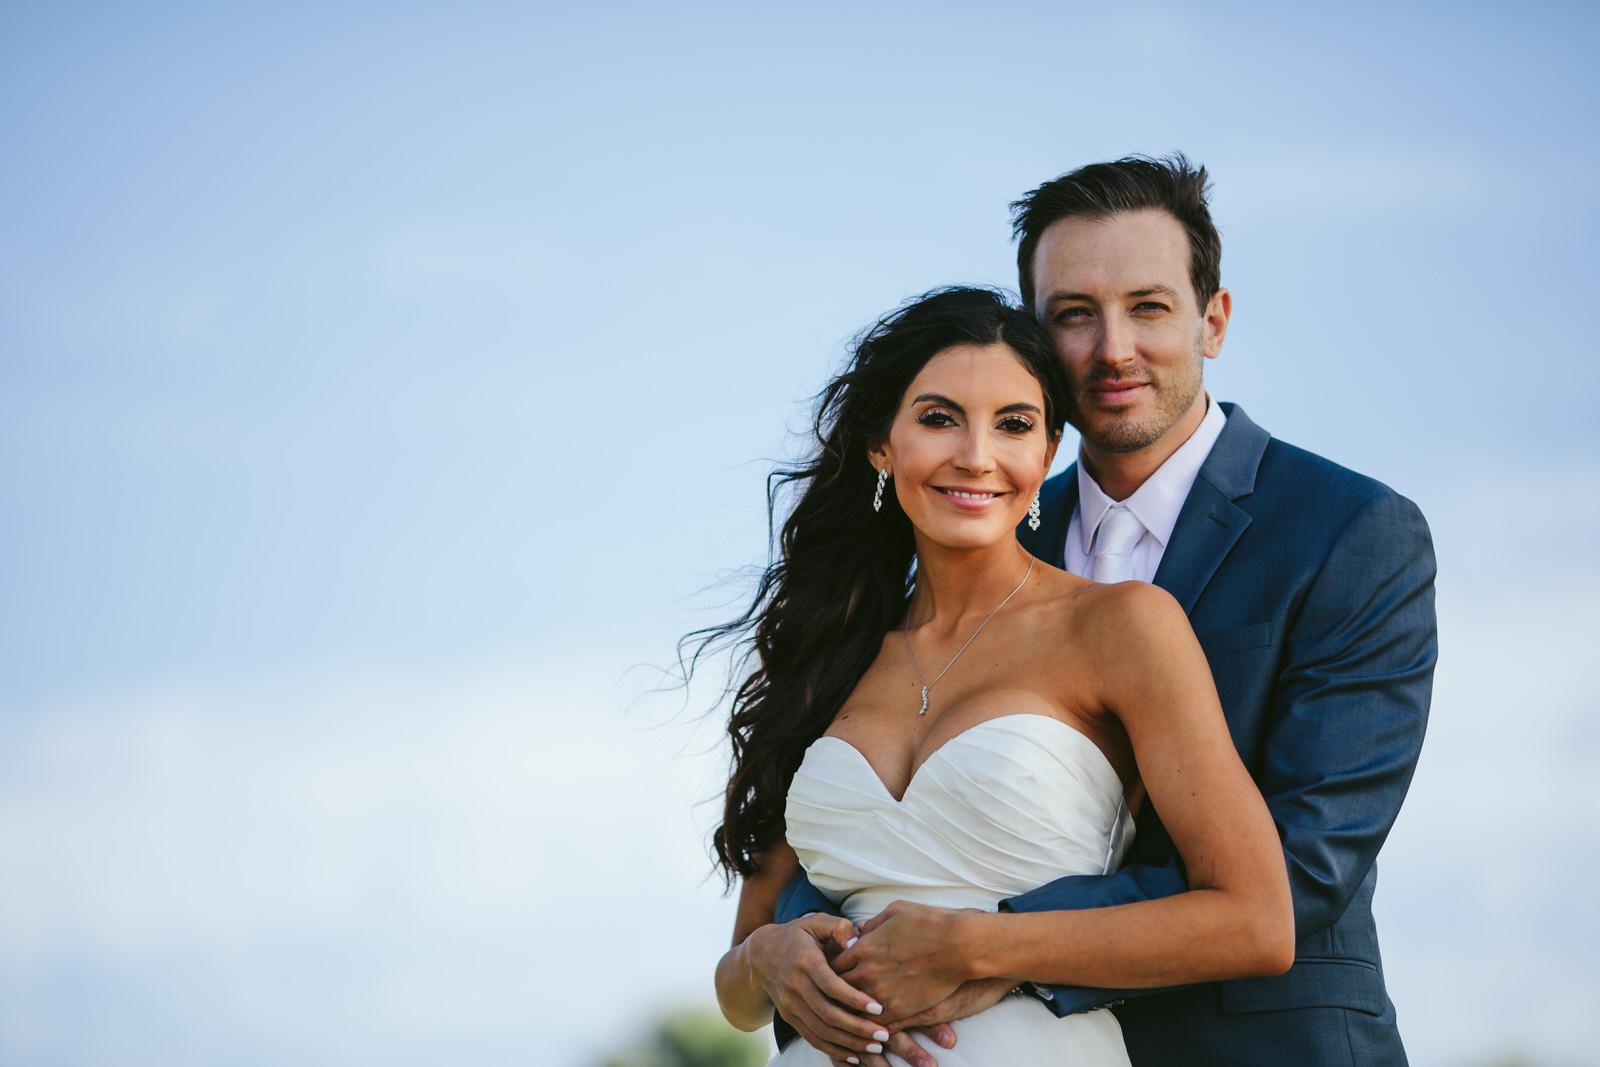 bride_and_groom_jensen_beach_wedding_day-188.jpg